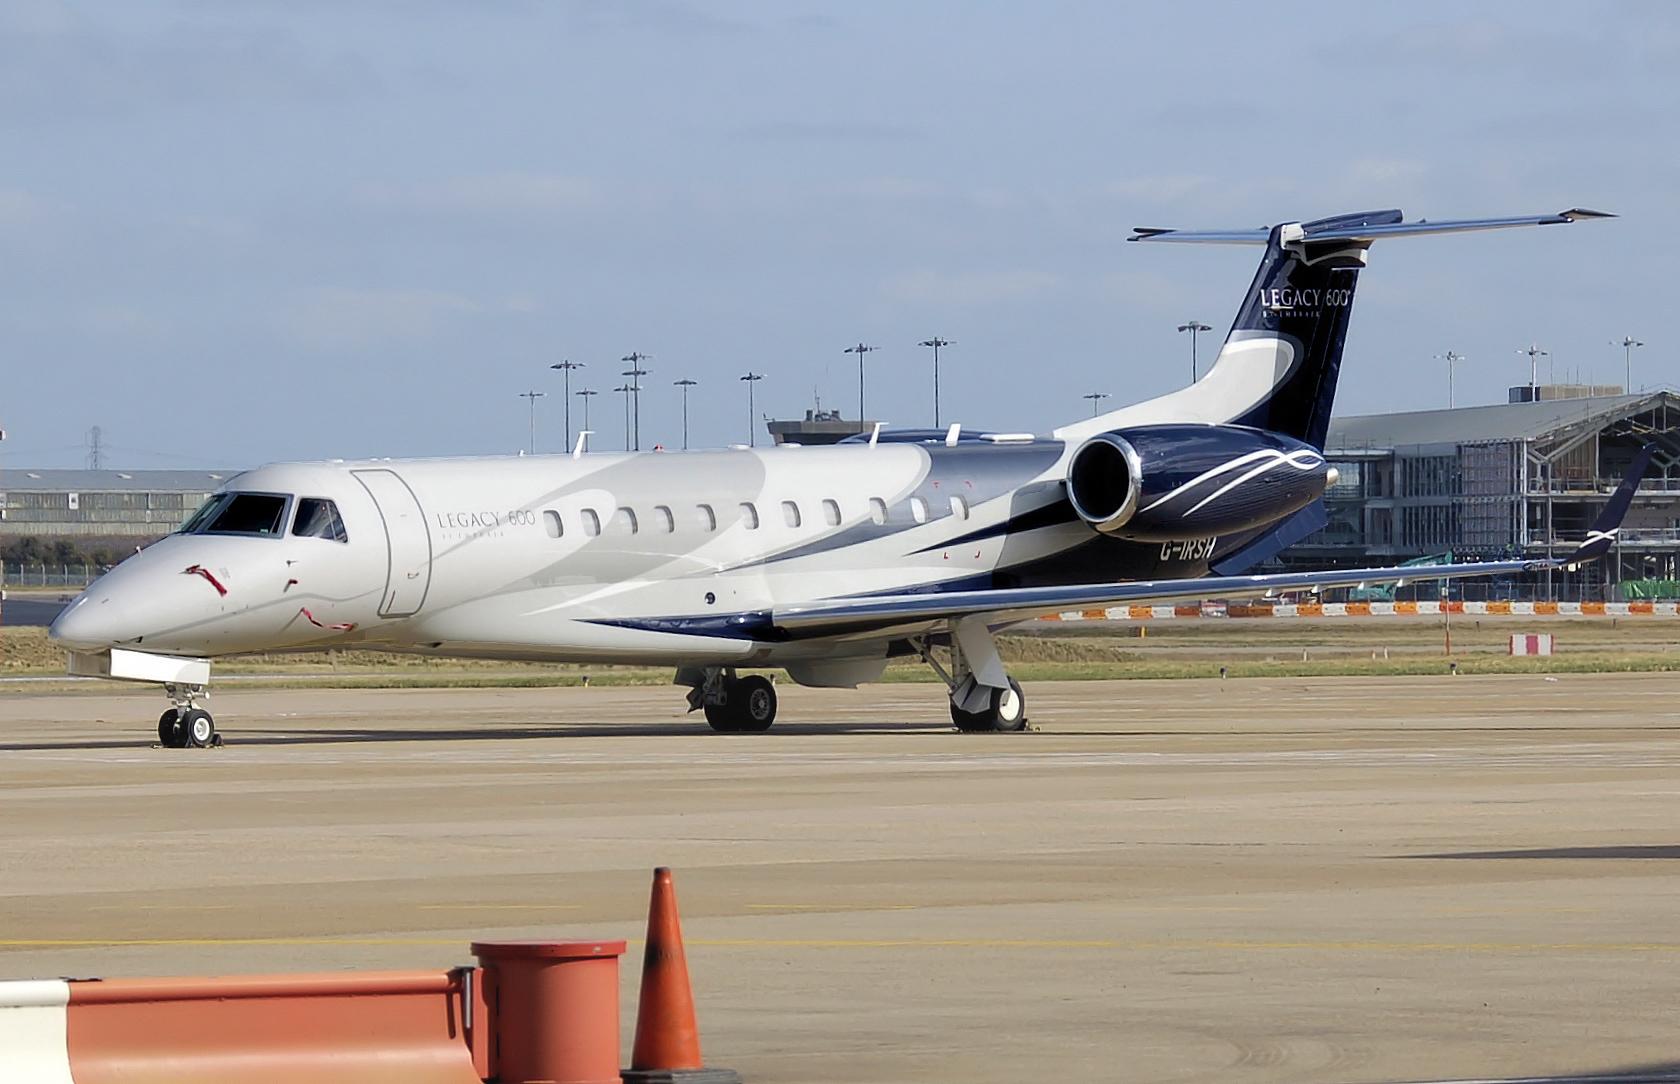 File:Embraer legacy 600 g-irsh arp jpg - Wikimedia Commons